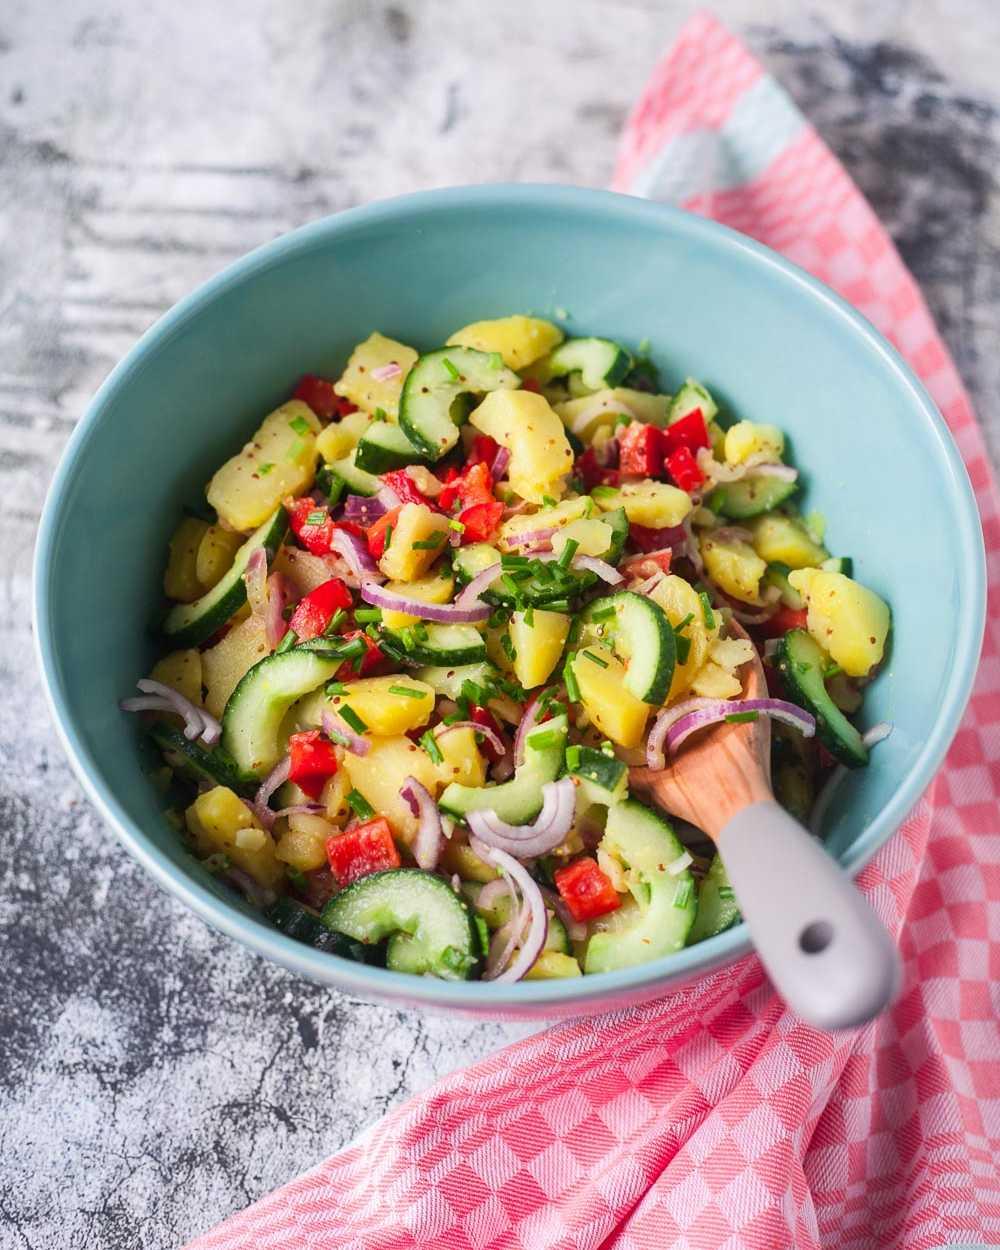 Bunter Kartoffelsalat mit Gurke und Paprika zum Steak oder Veggi-Bratling unter 500 Kalorien |GourmetGuerilla.de